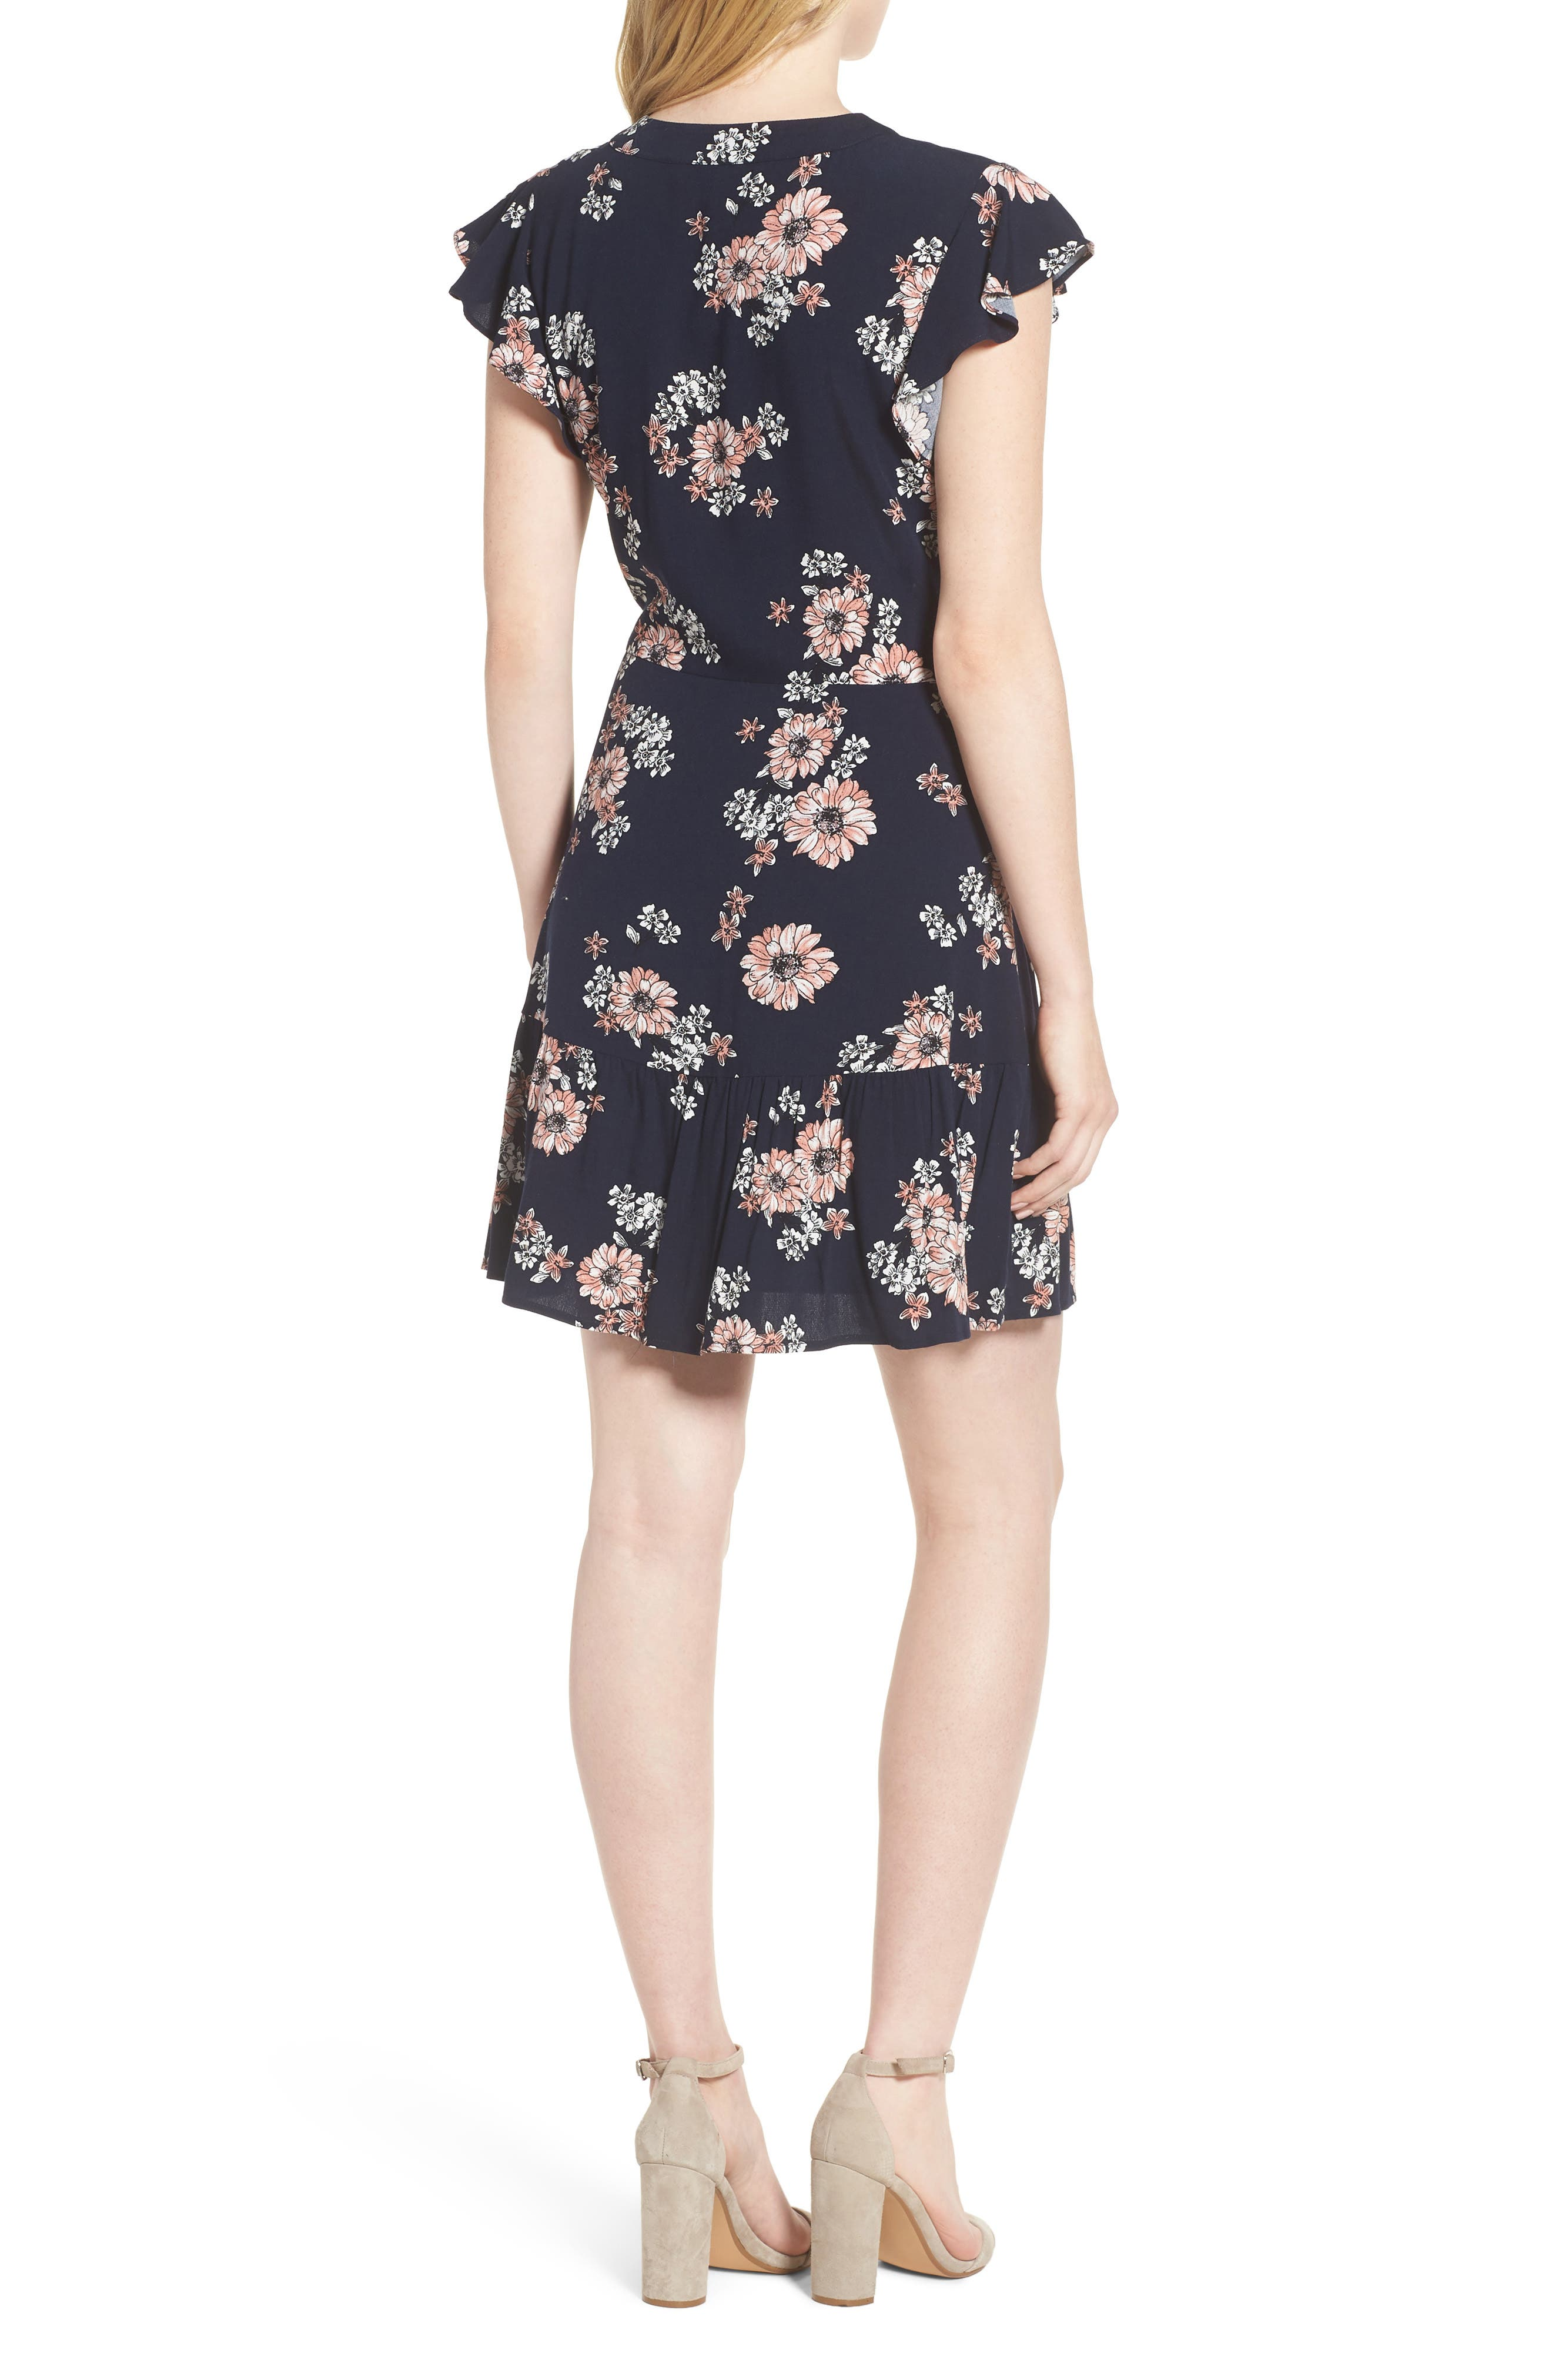 Dalma Floral Print Dress,                             Alternate thumbnail 2, color,